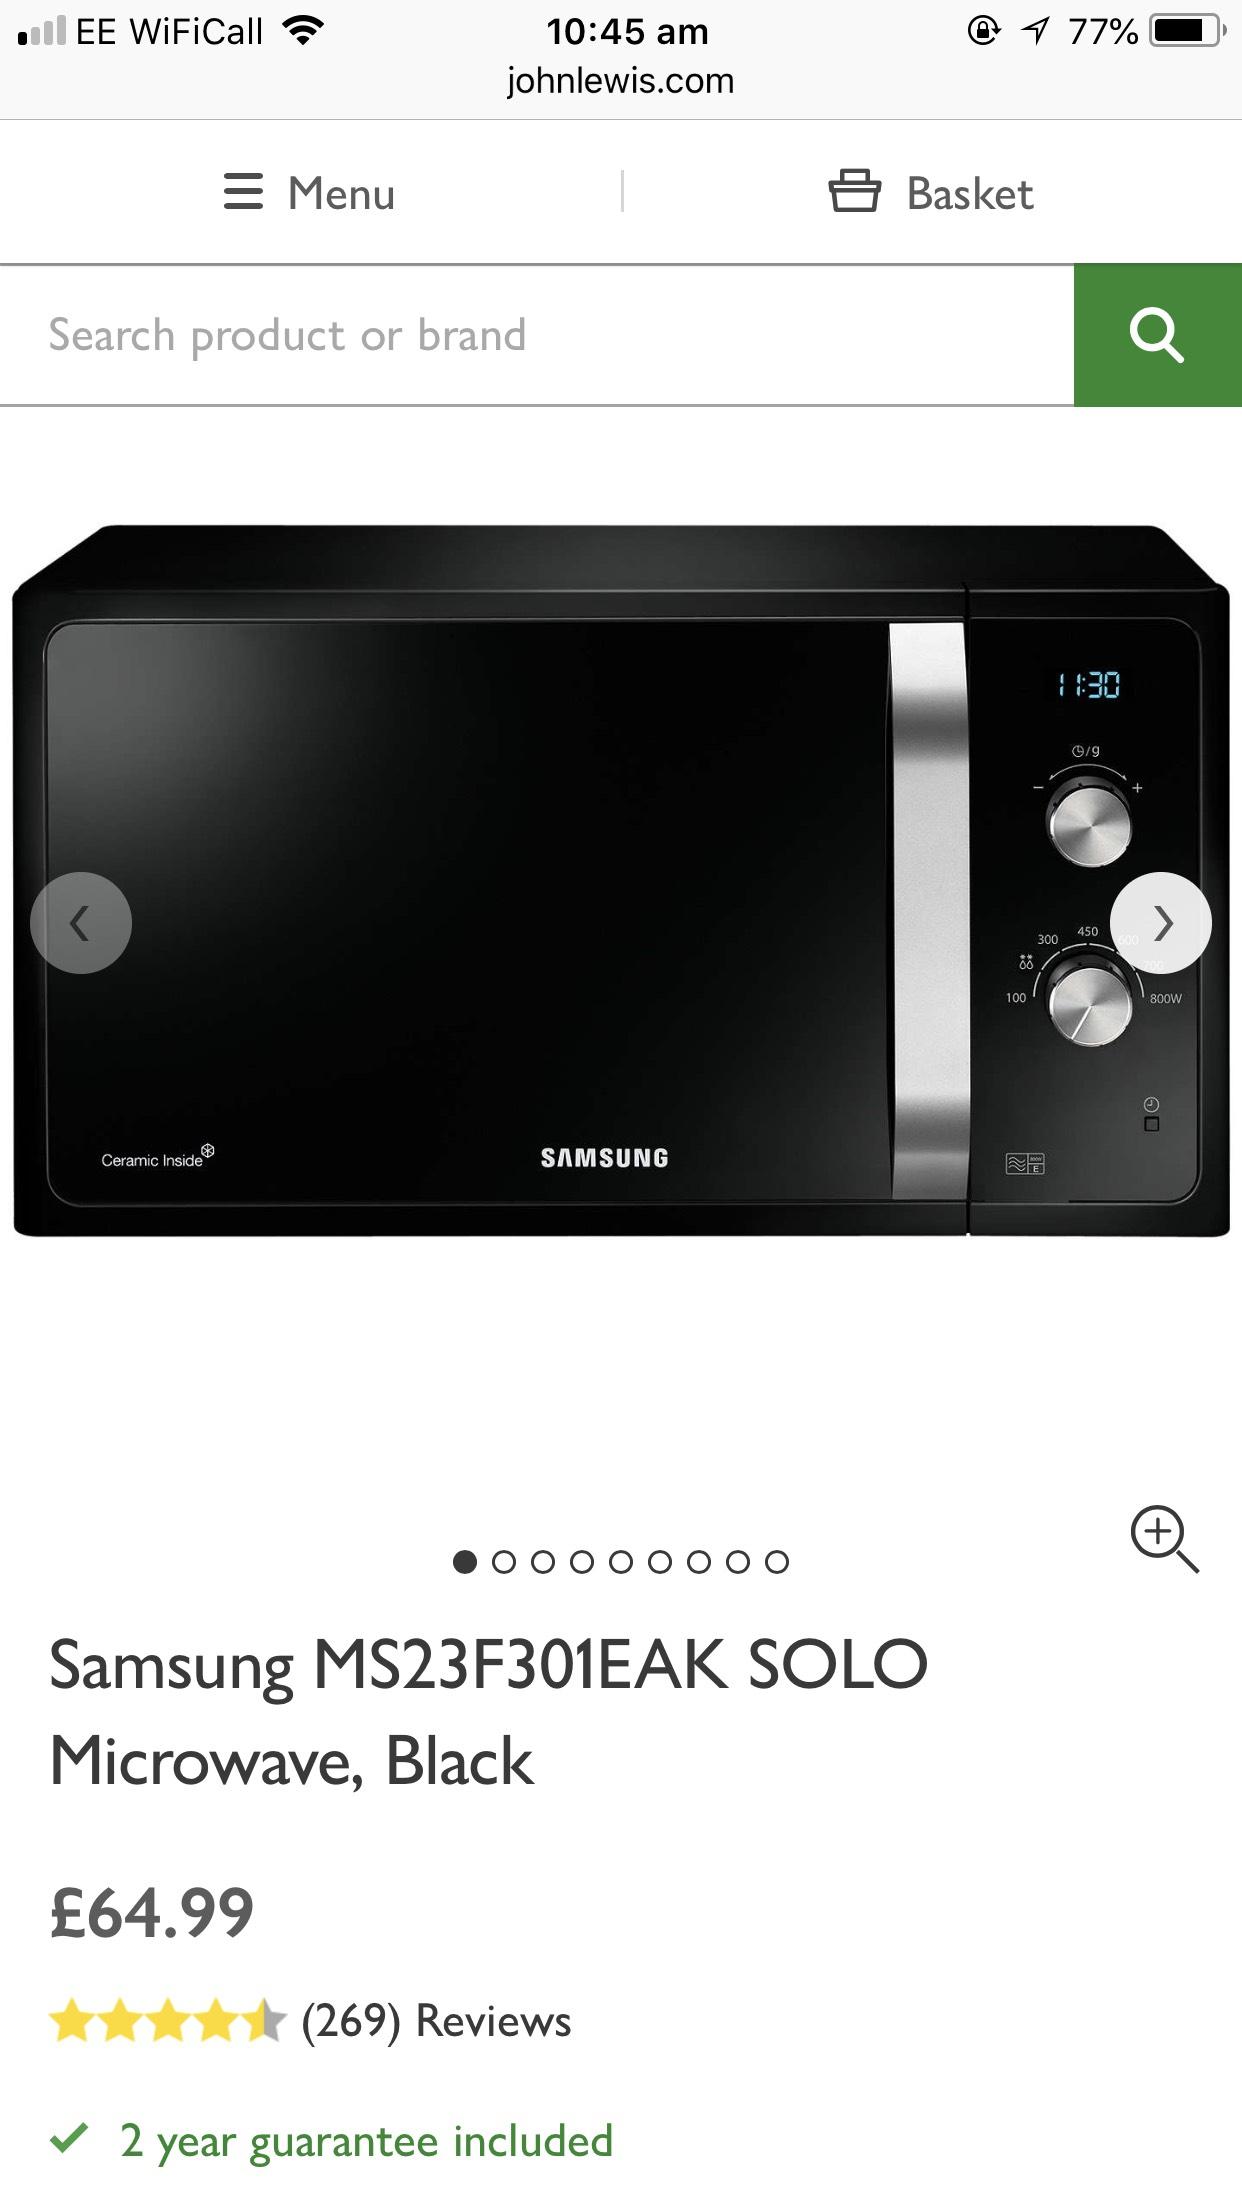 Samsung MS23F301EAK SOLO Microwave, Black £64.99 @ John lewis